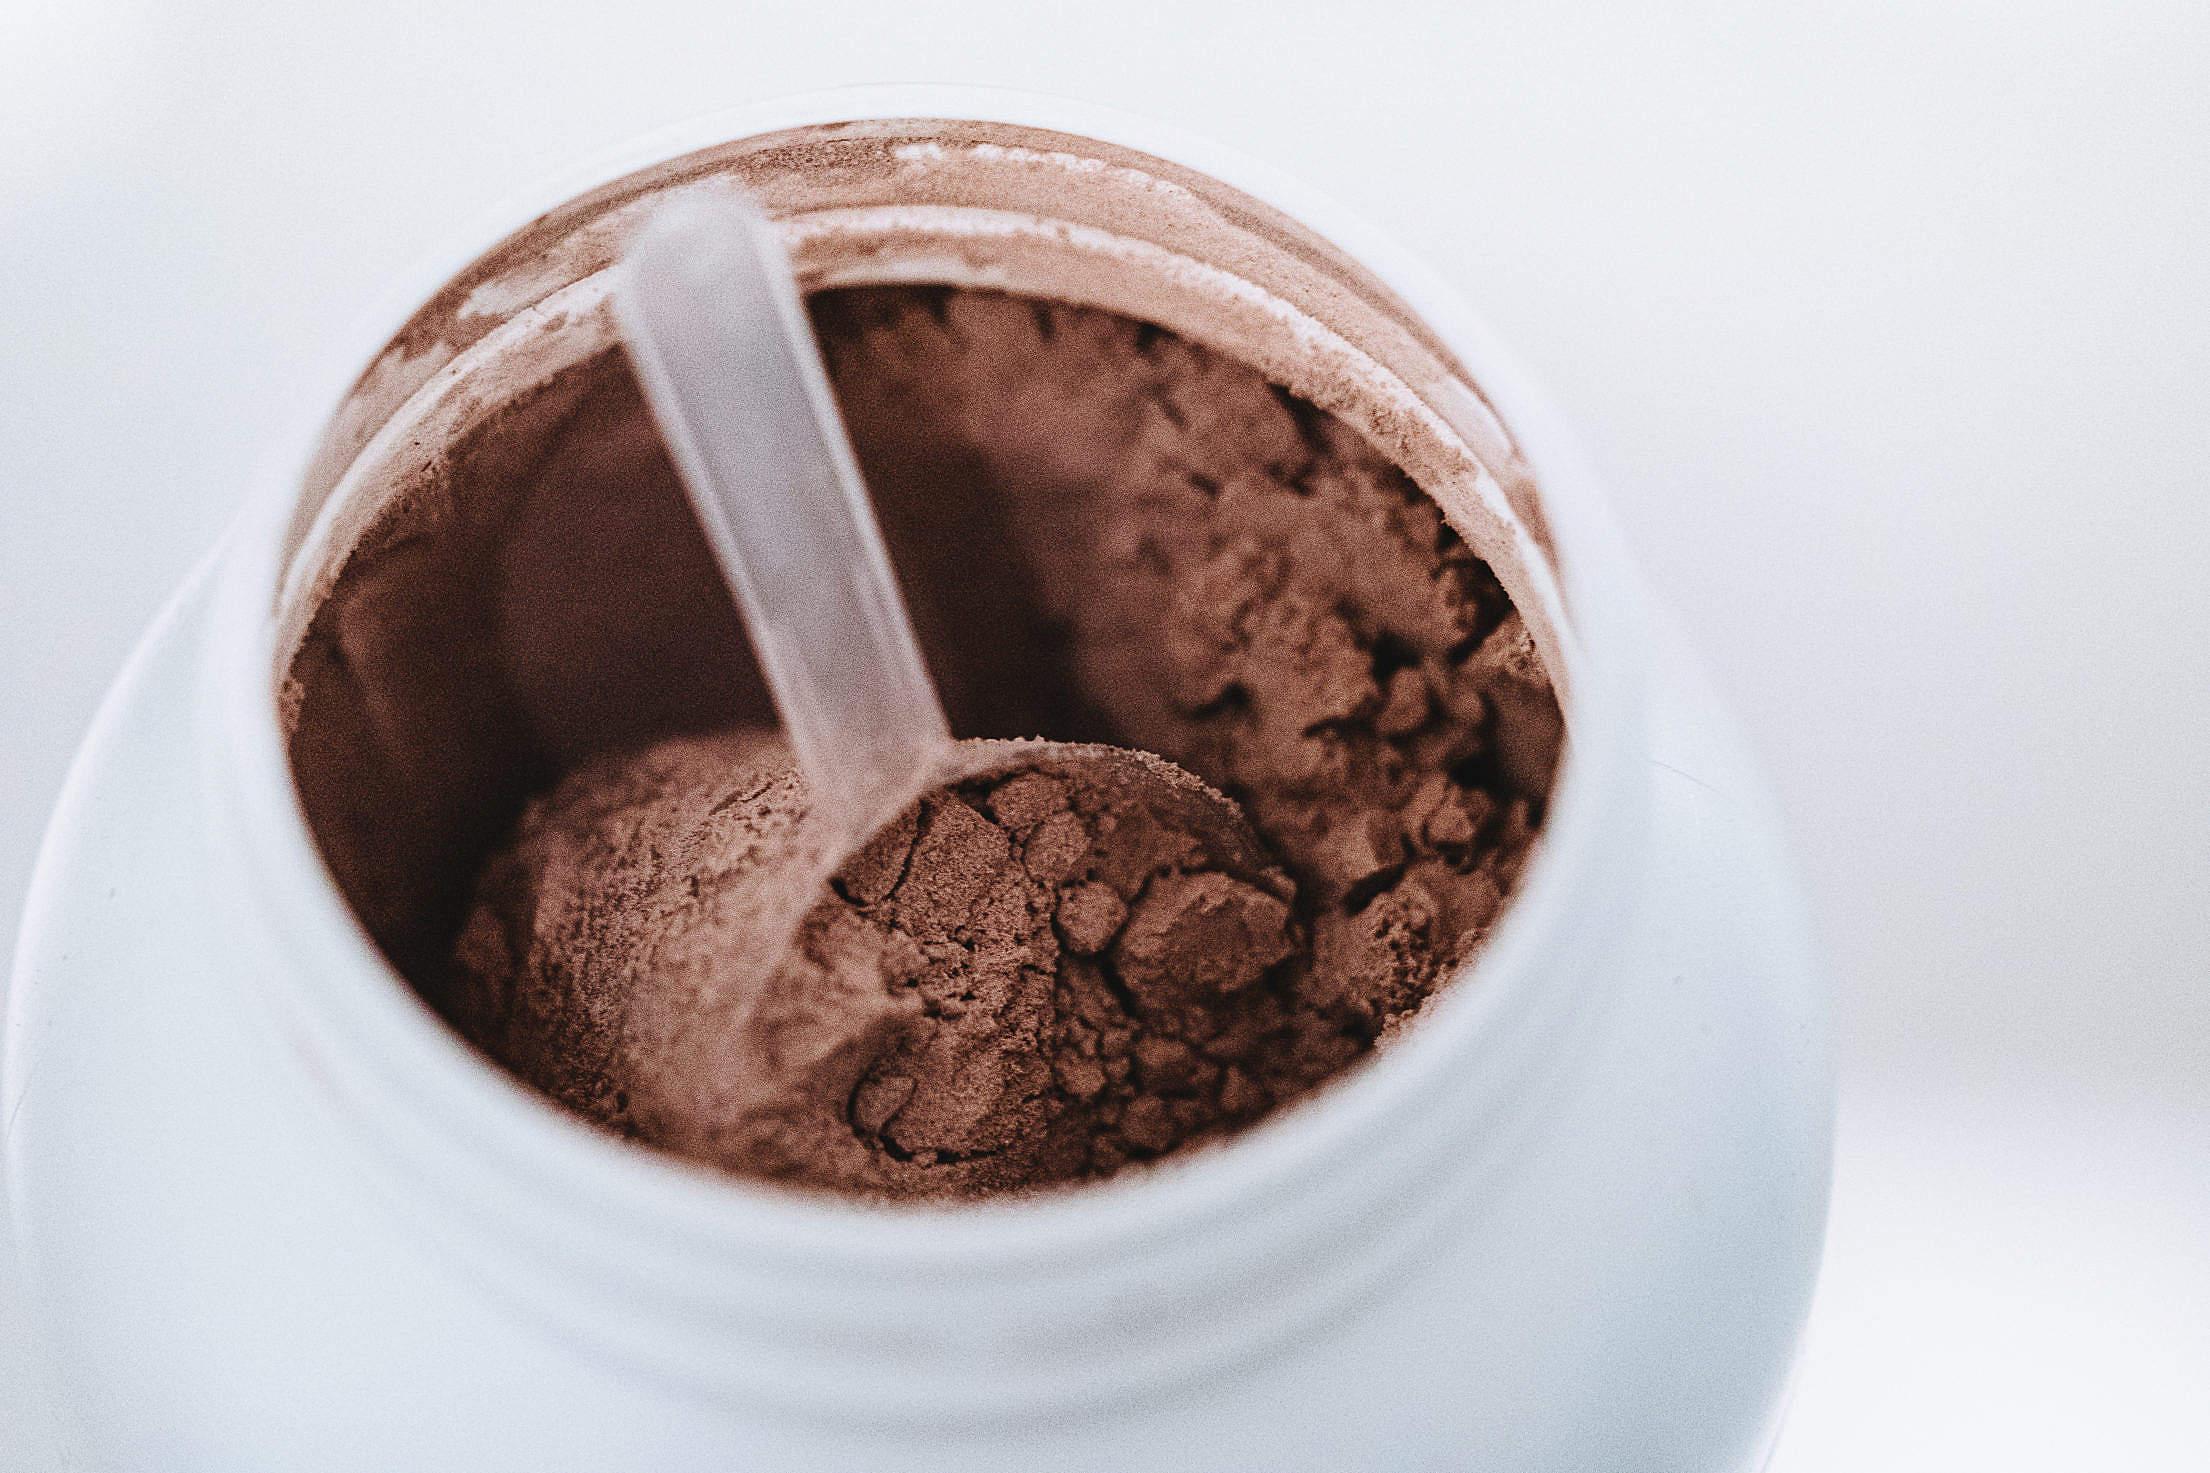 Chocolate Protein Powder Free Stock Photo